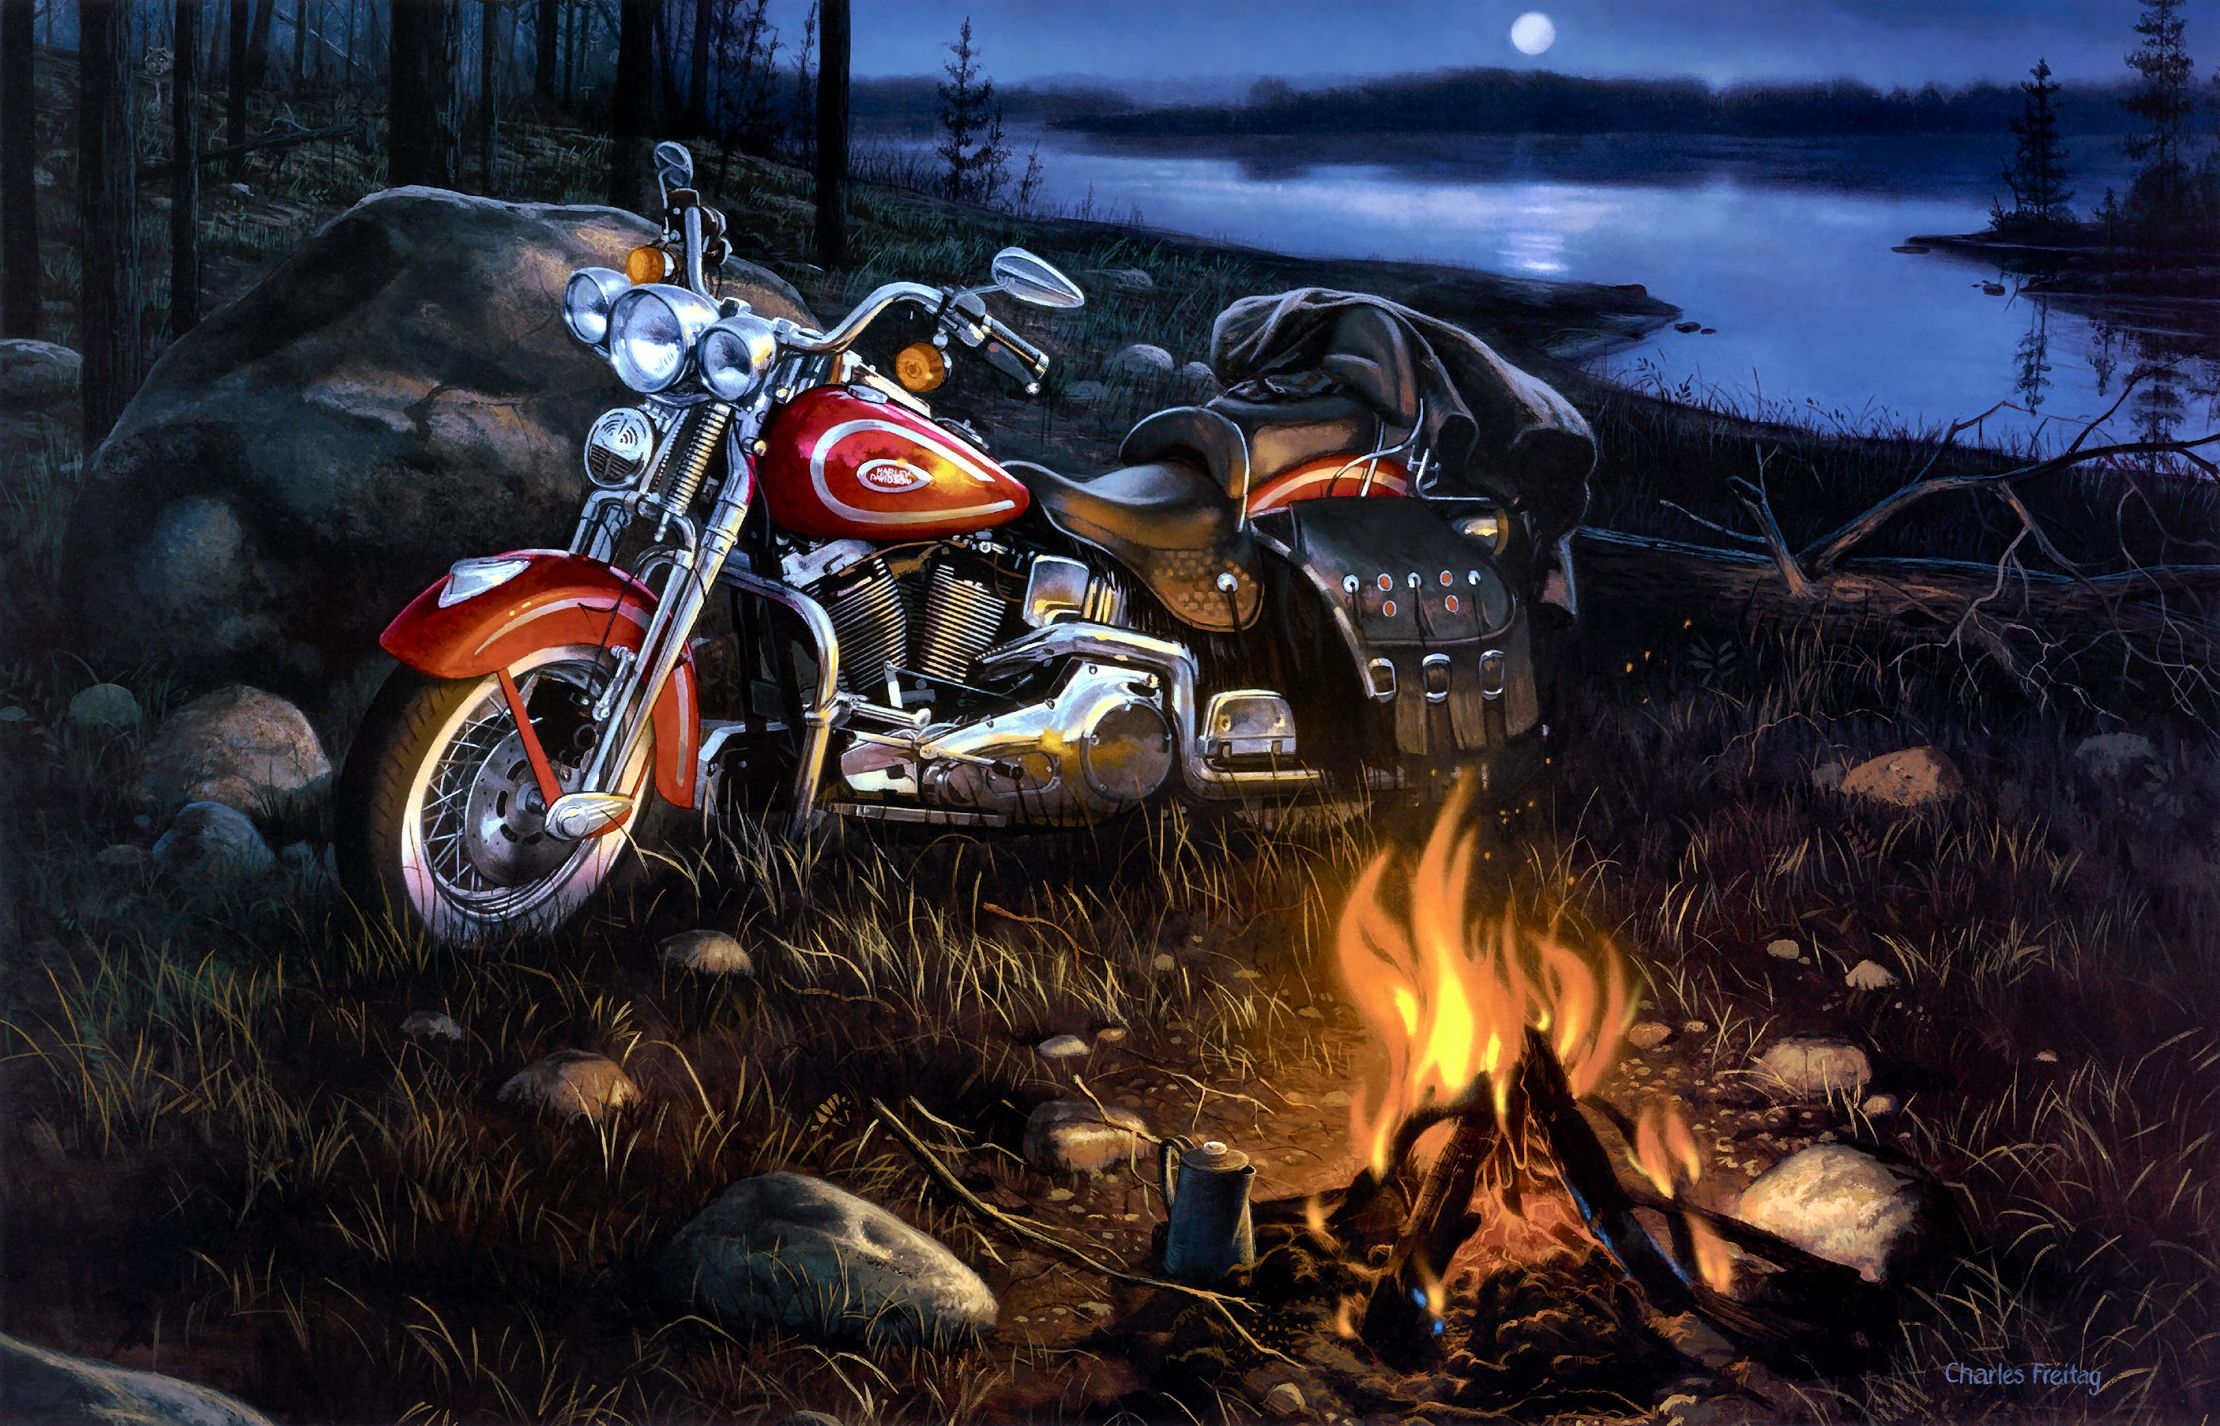 Harley Davidson motorcycle 2220x1426